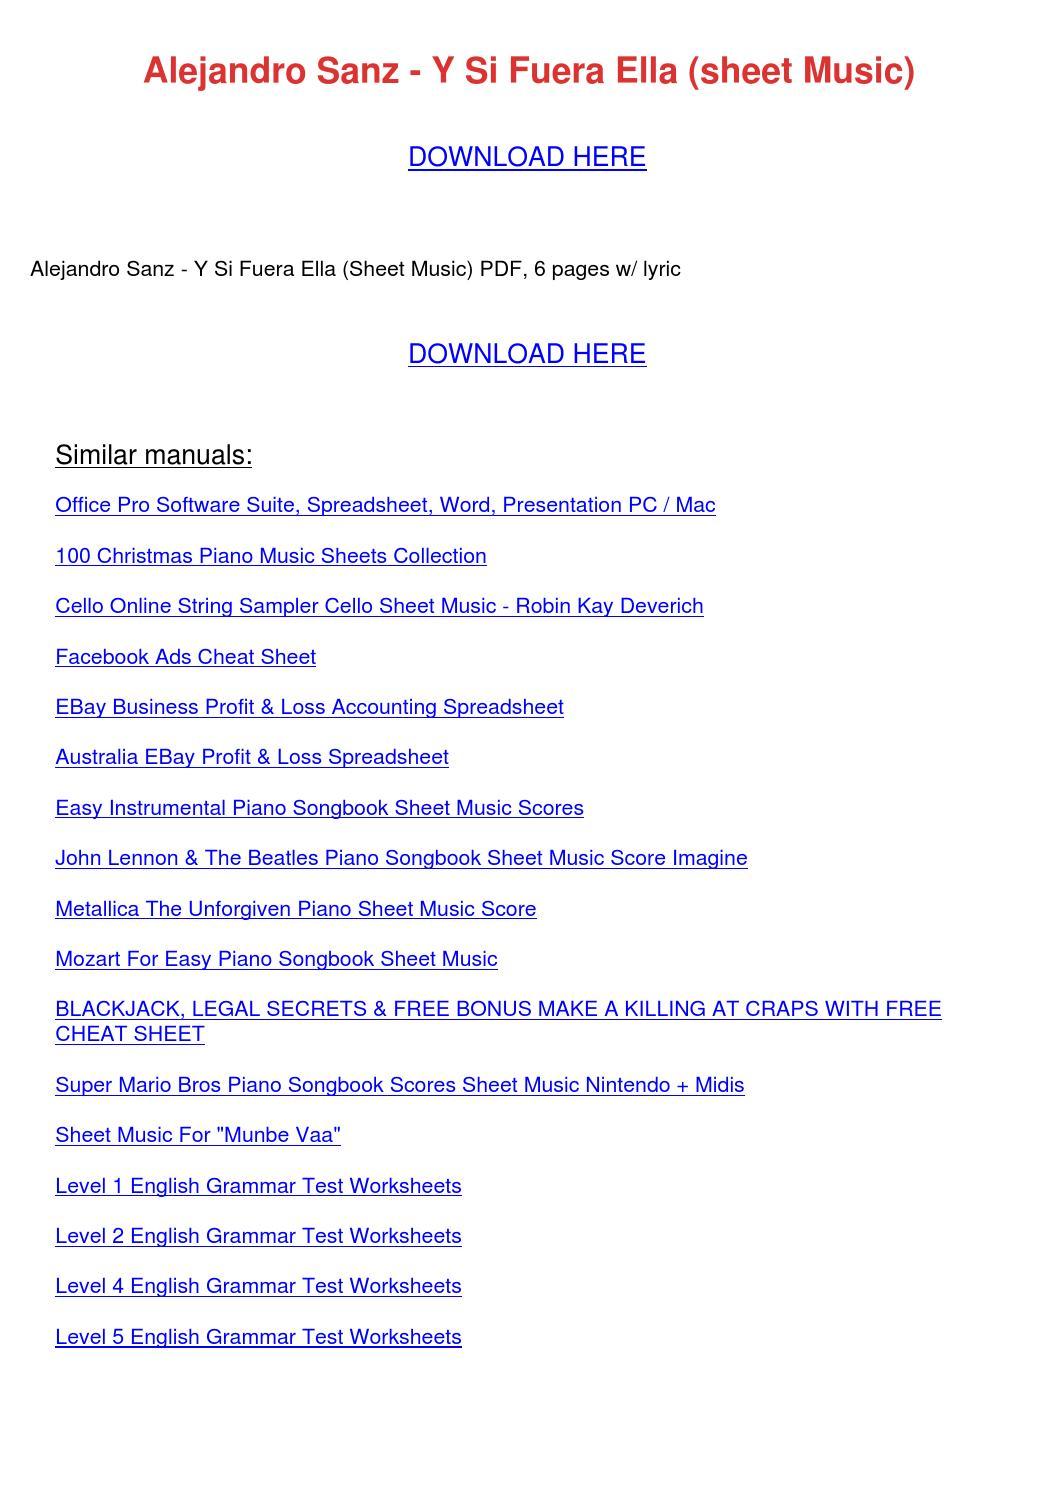 worksheet Forrest Gump Worksheet alejandro sanz y si fuera ella sheet music by kristinakeenan issuu